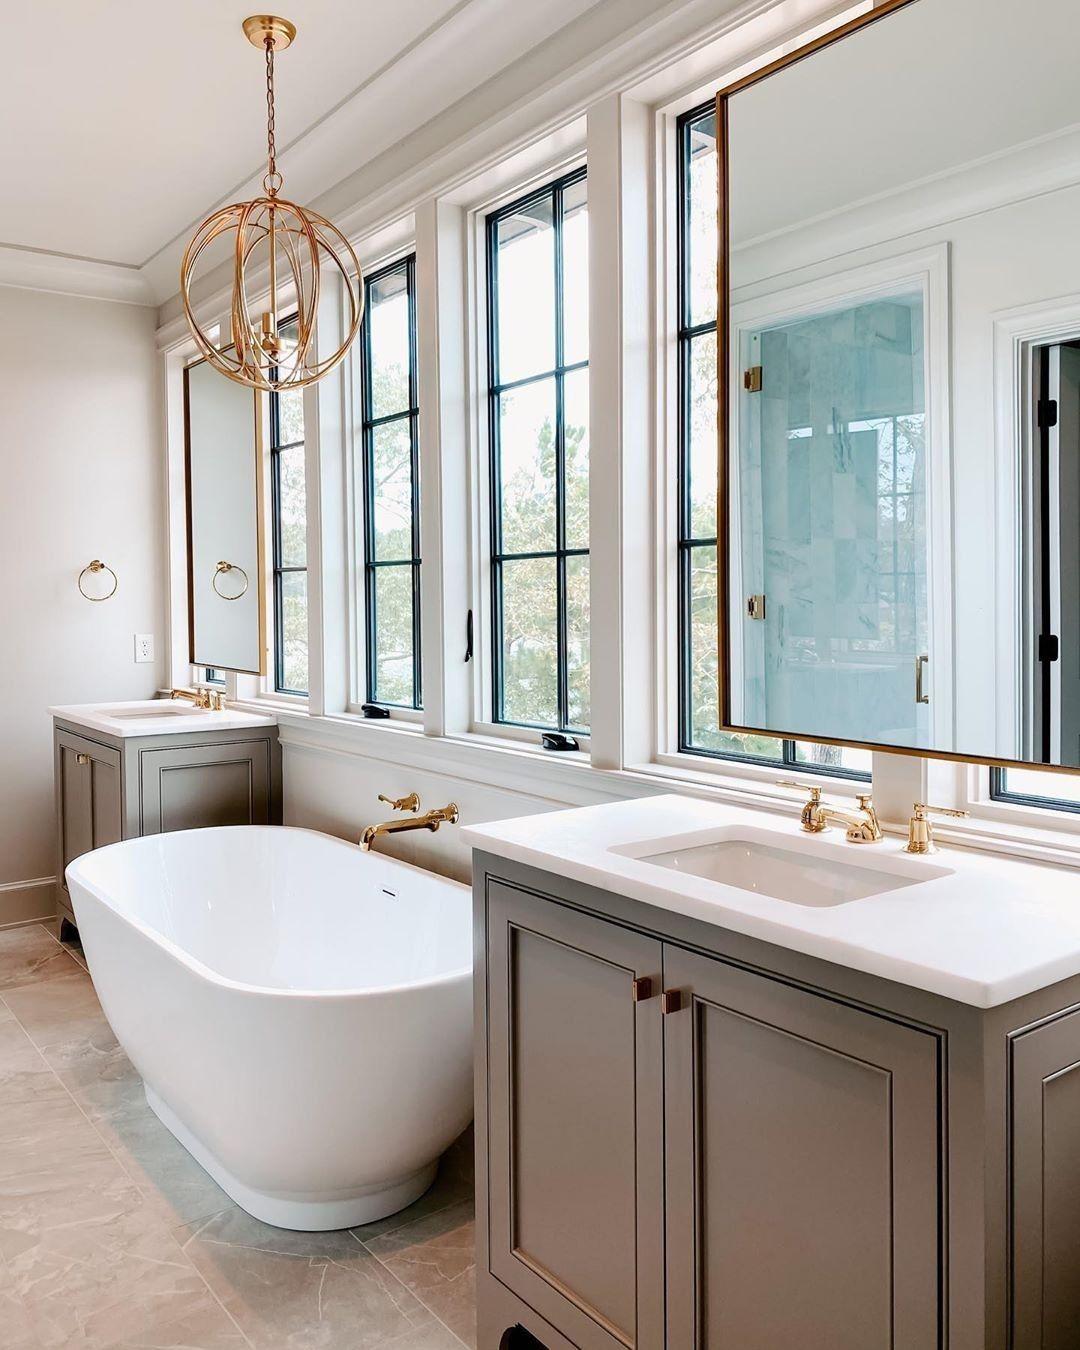 Bathroom Goals Bathroom Design Spa Bathroom Decor Master Bath Layout